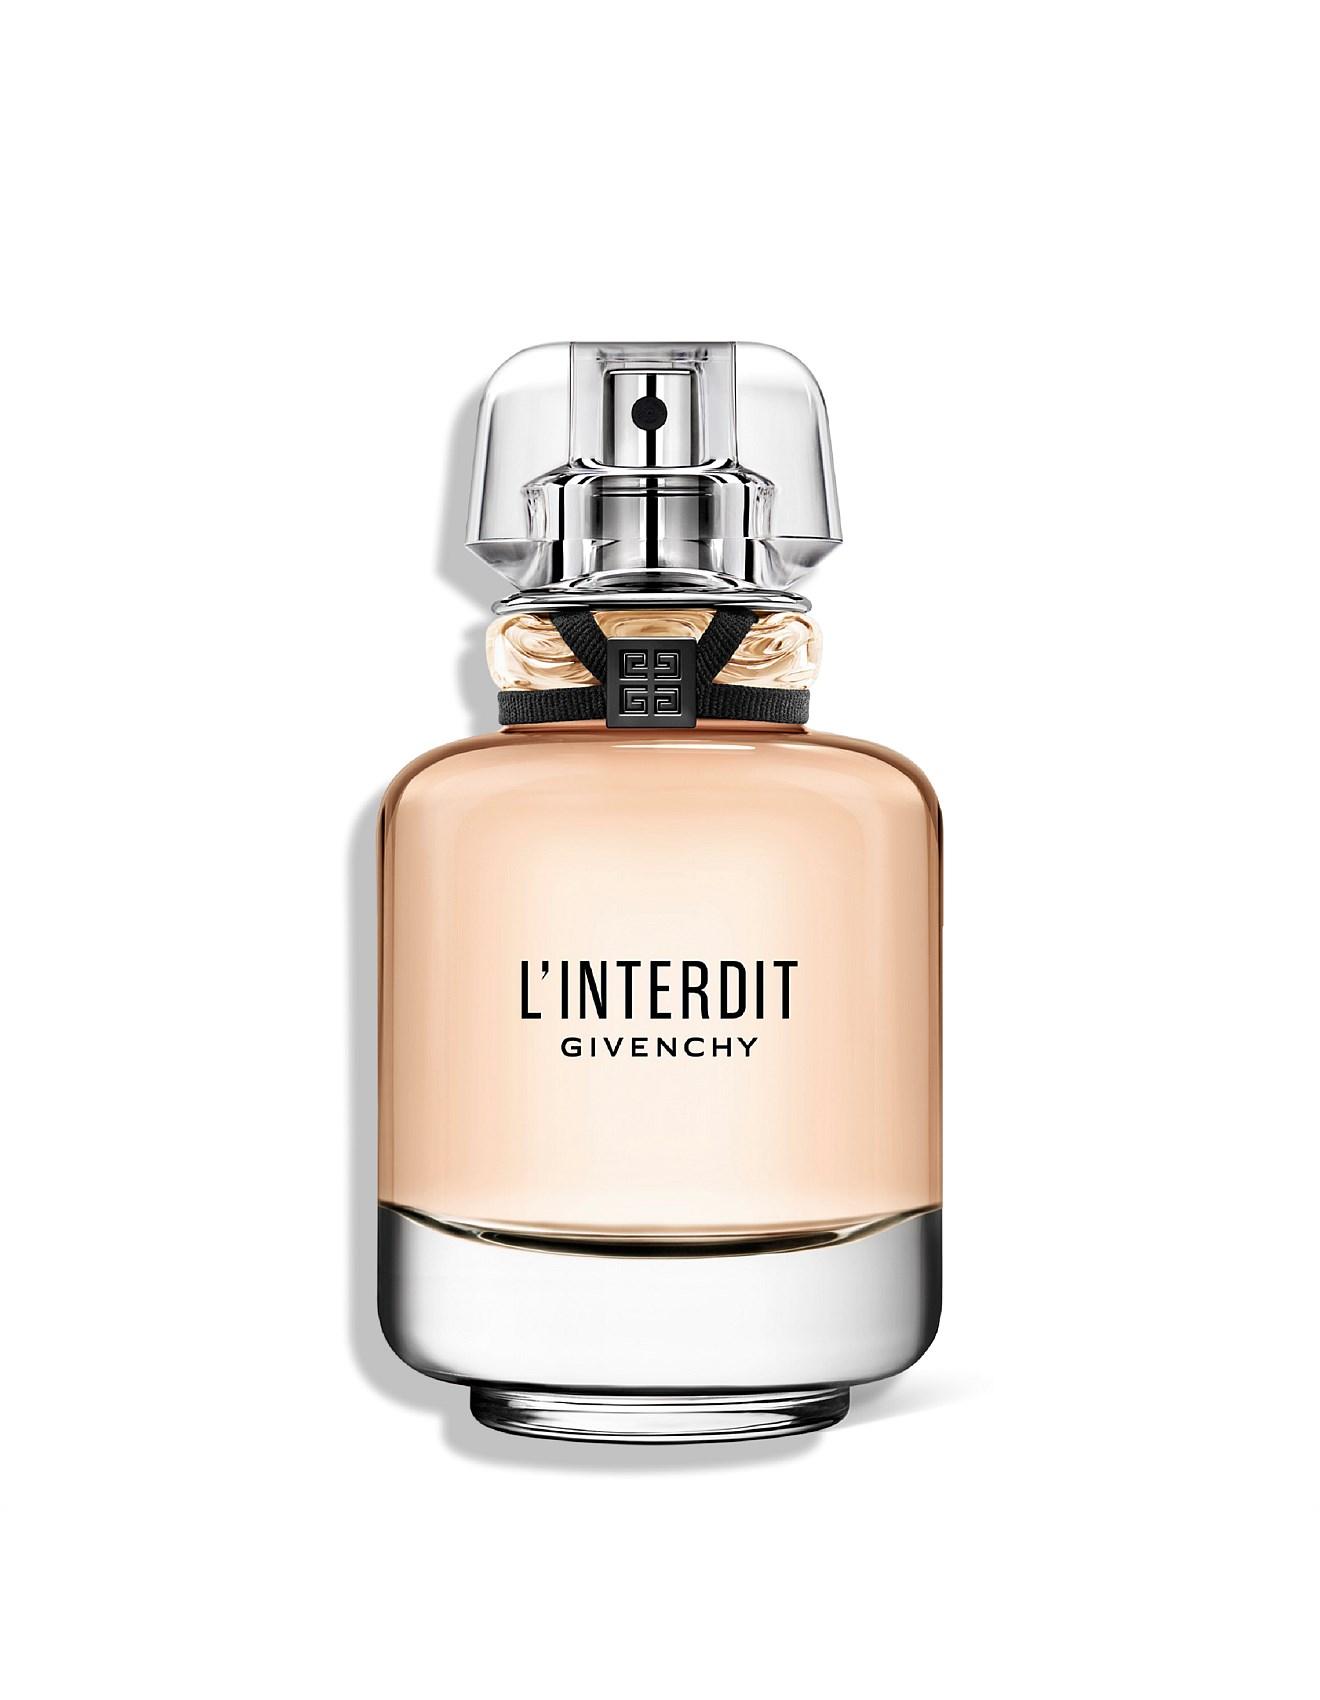 1e5039e4f8ea6 Perfume   Buy Fragrances   Perfume Online   David Jones - L INTERDIT ...